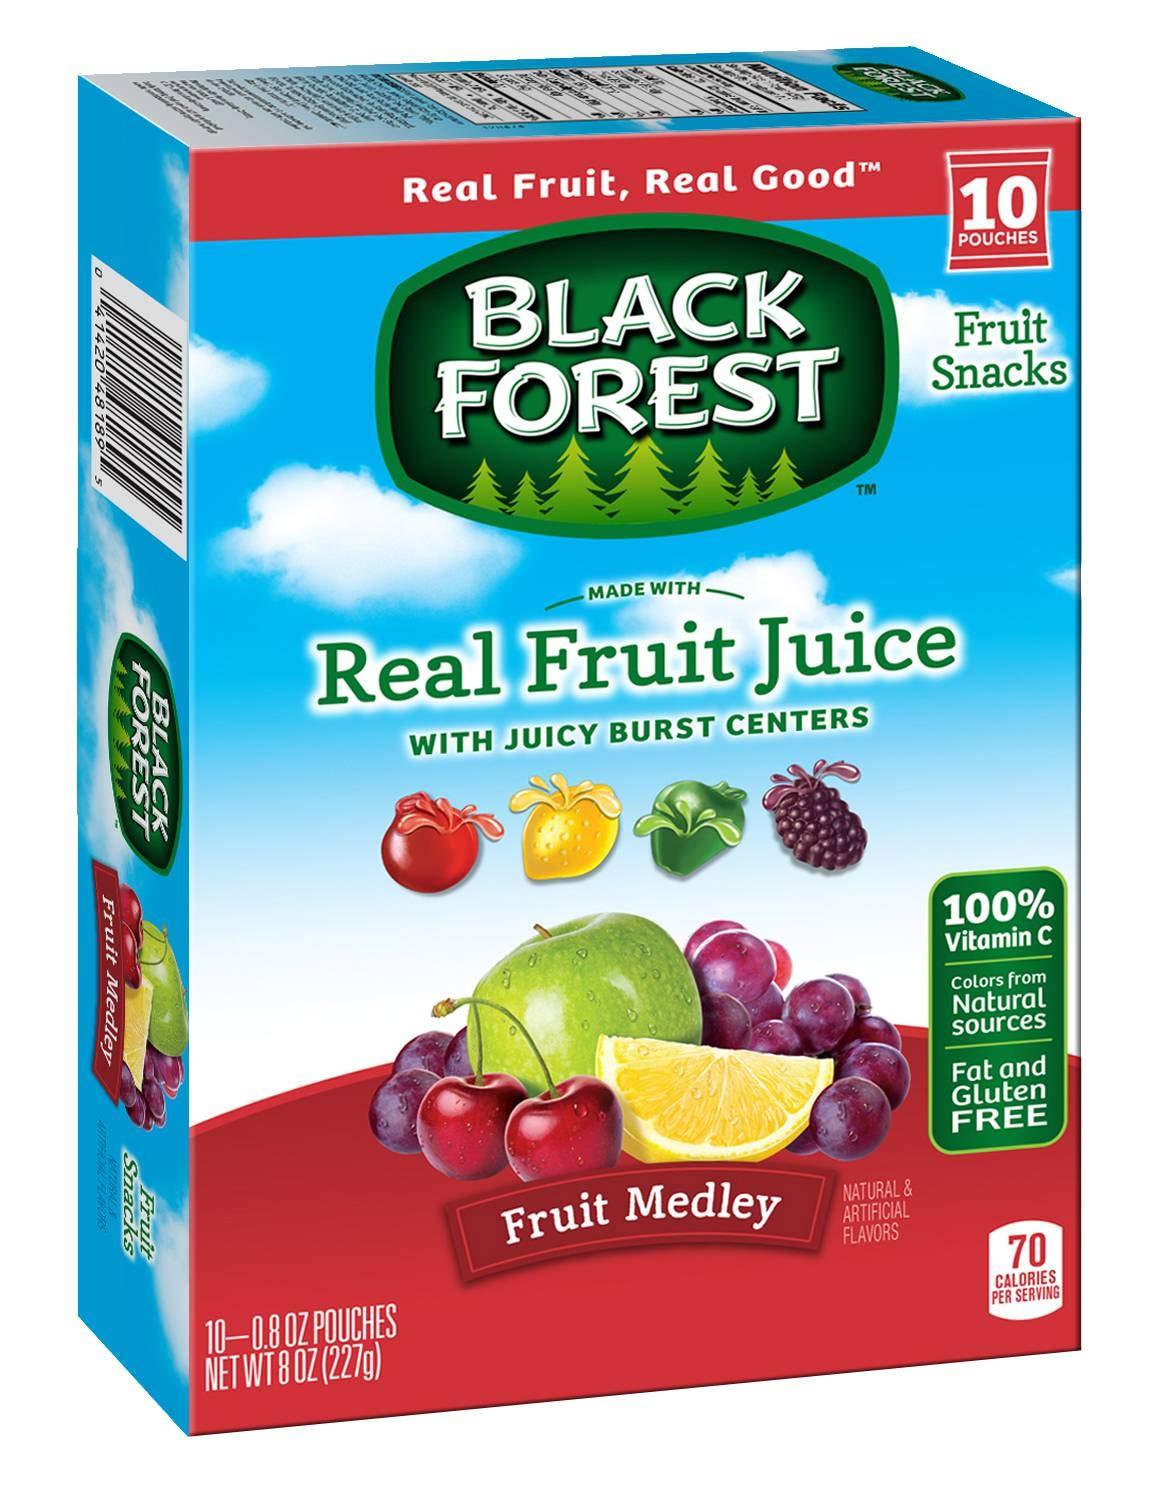 Black Forest Fruit Snacks, Fruit Medley, 0.9 Ounce Bag, Pack of 10